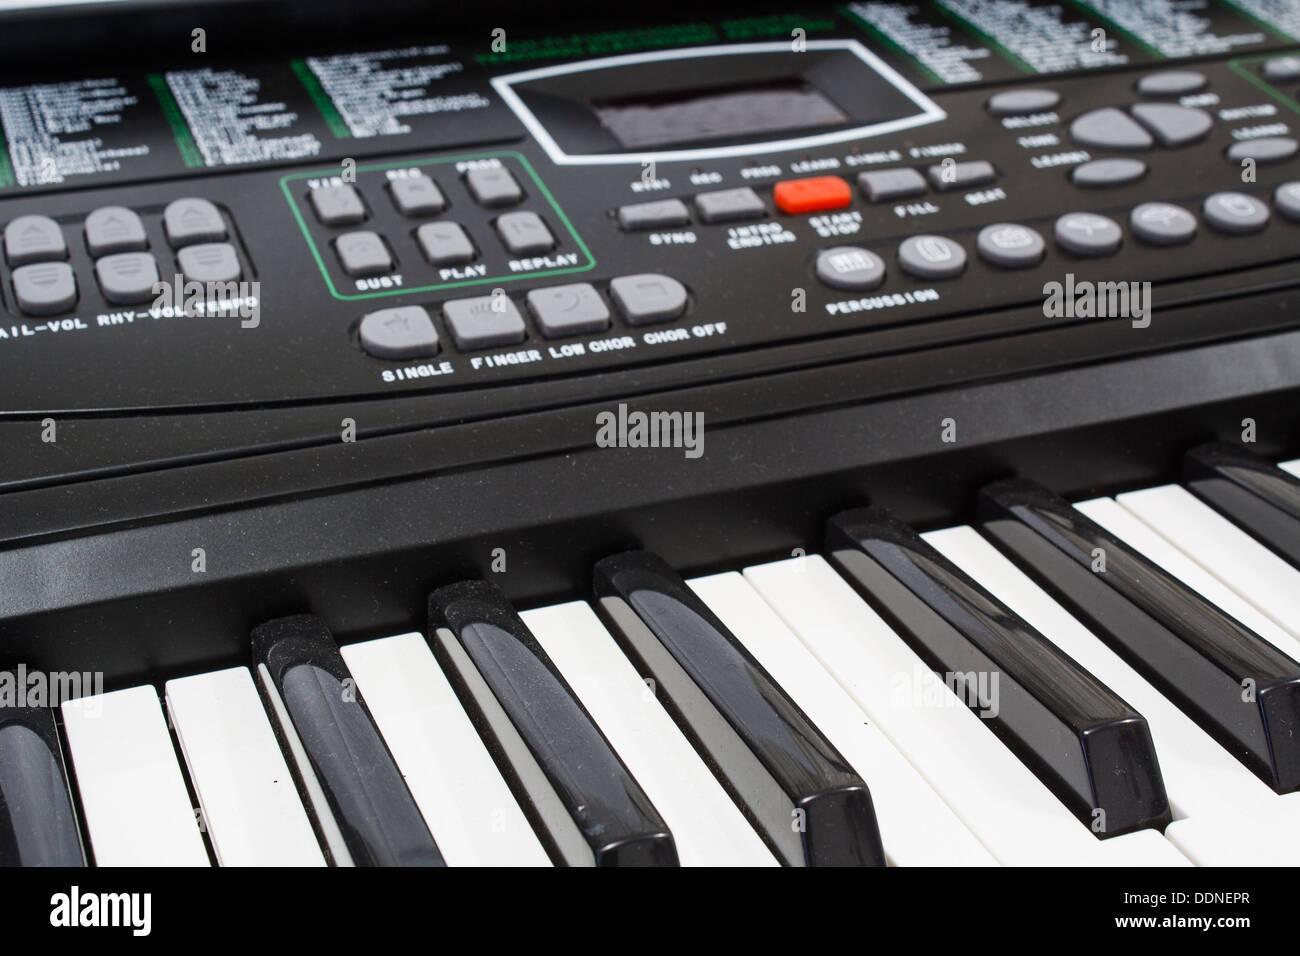 Electric keyboard colur black focus on the keypad. - Stock Image